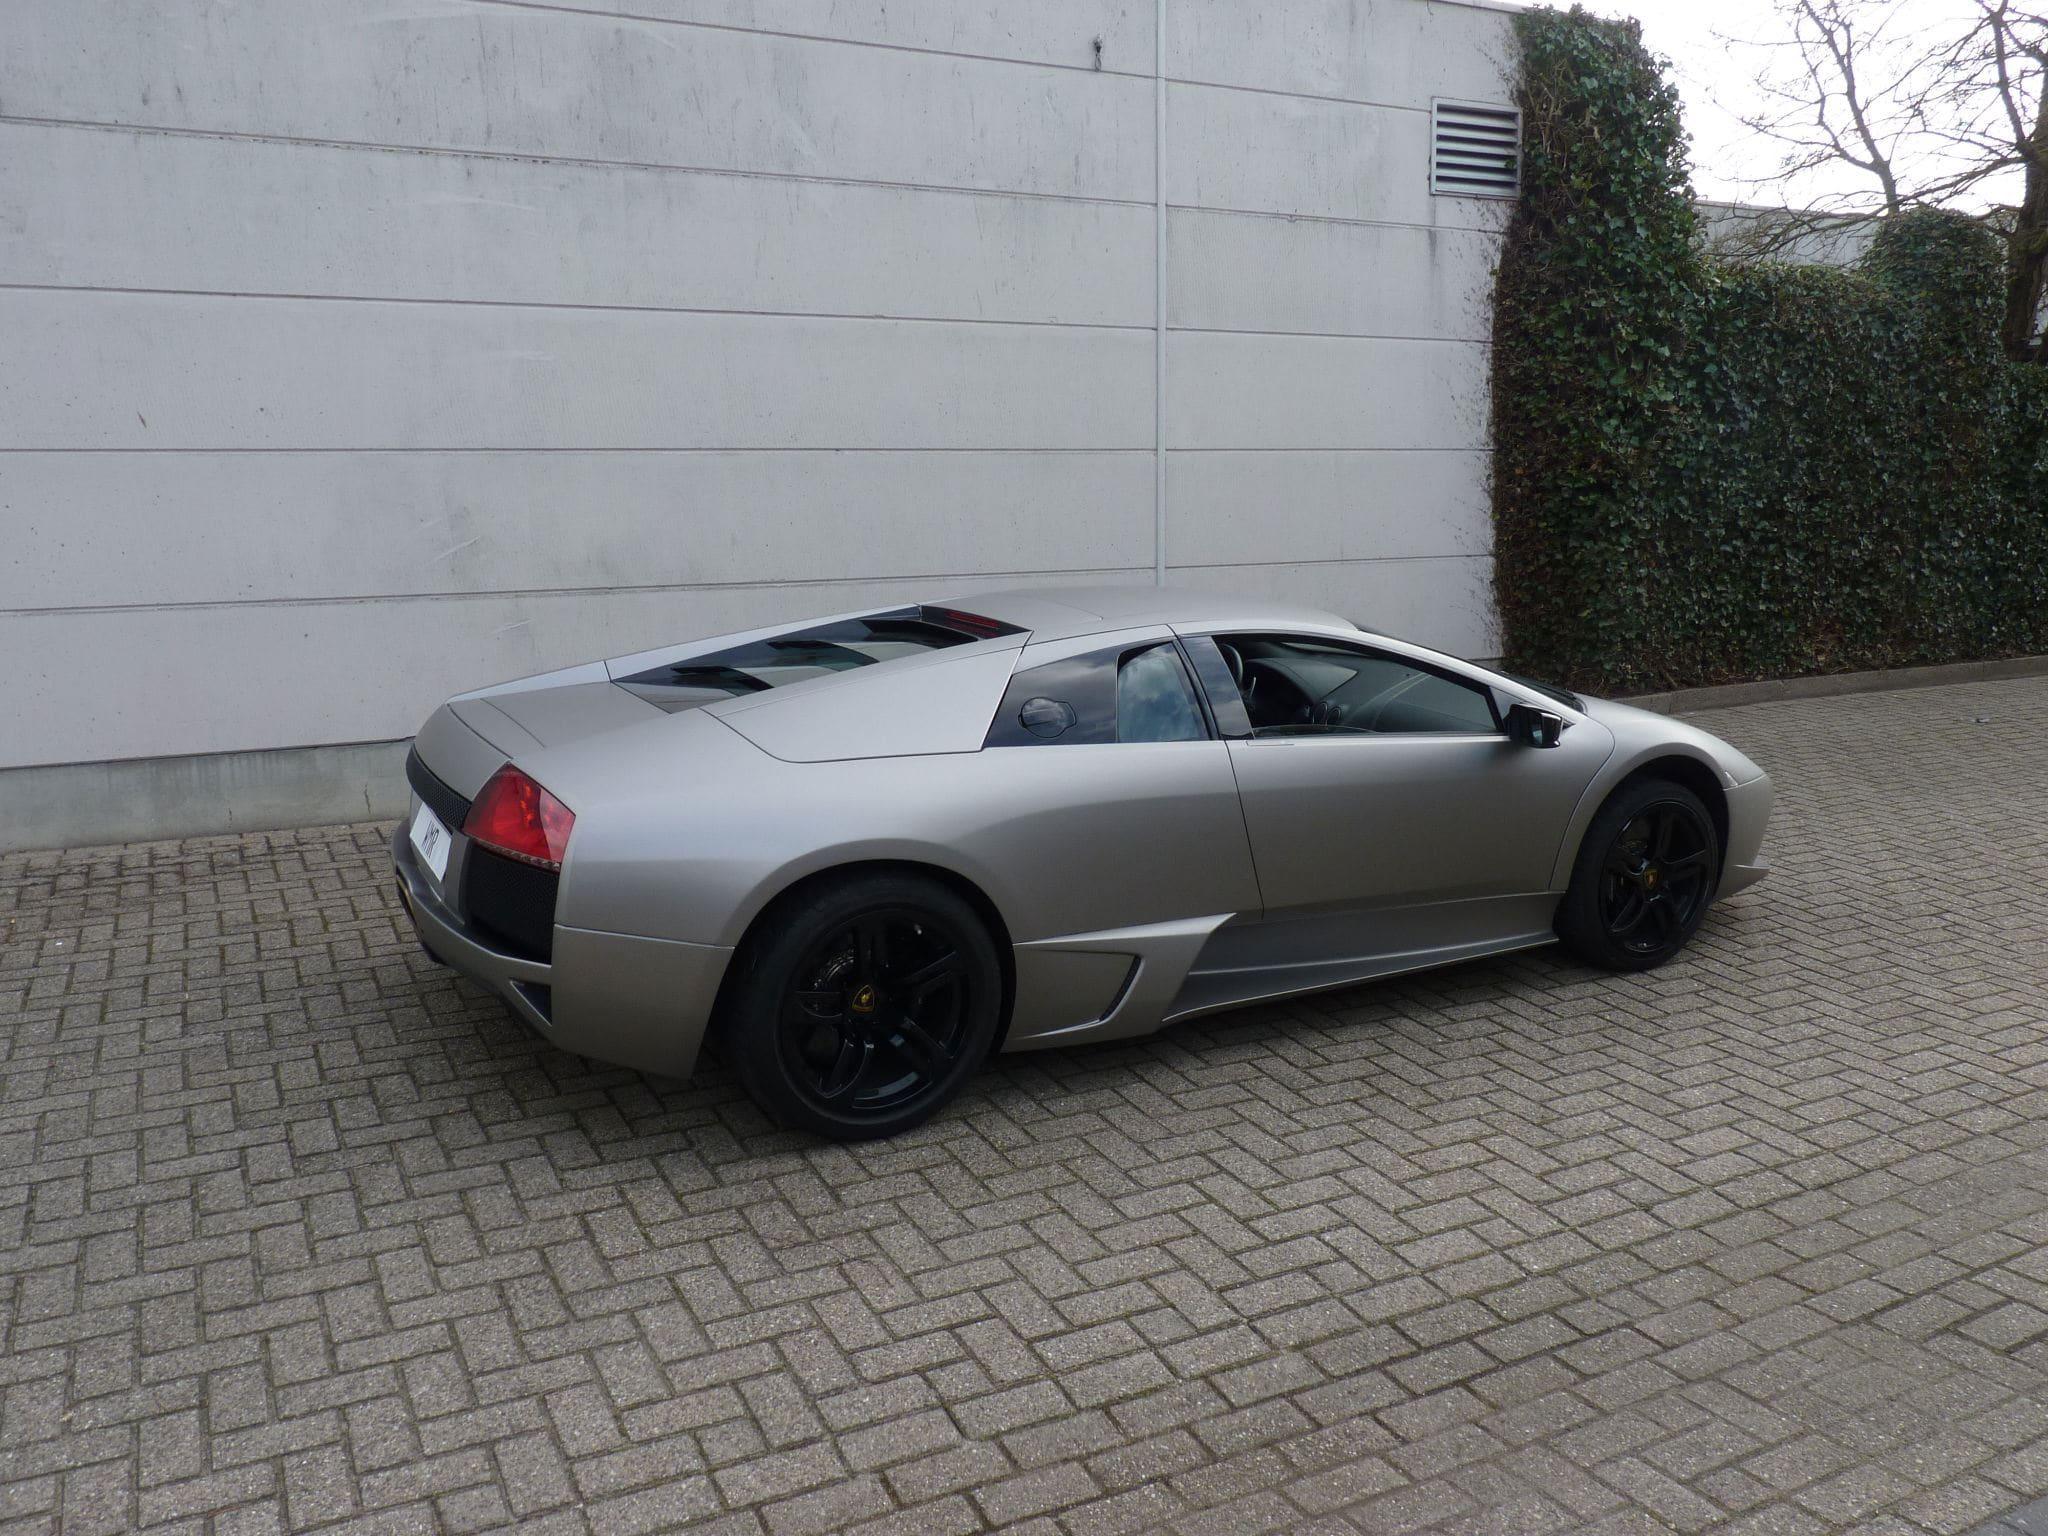 Lamborghini Murcialago LP670 met Gunpowder Wrap, Carwrapping door Wrapmyride.nu Foto-nr:6005, ©2021